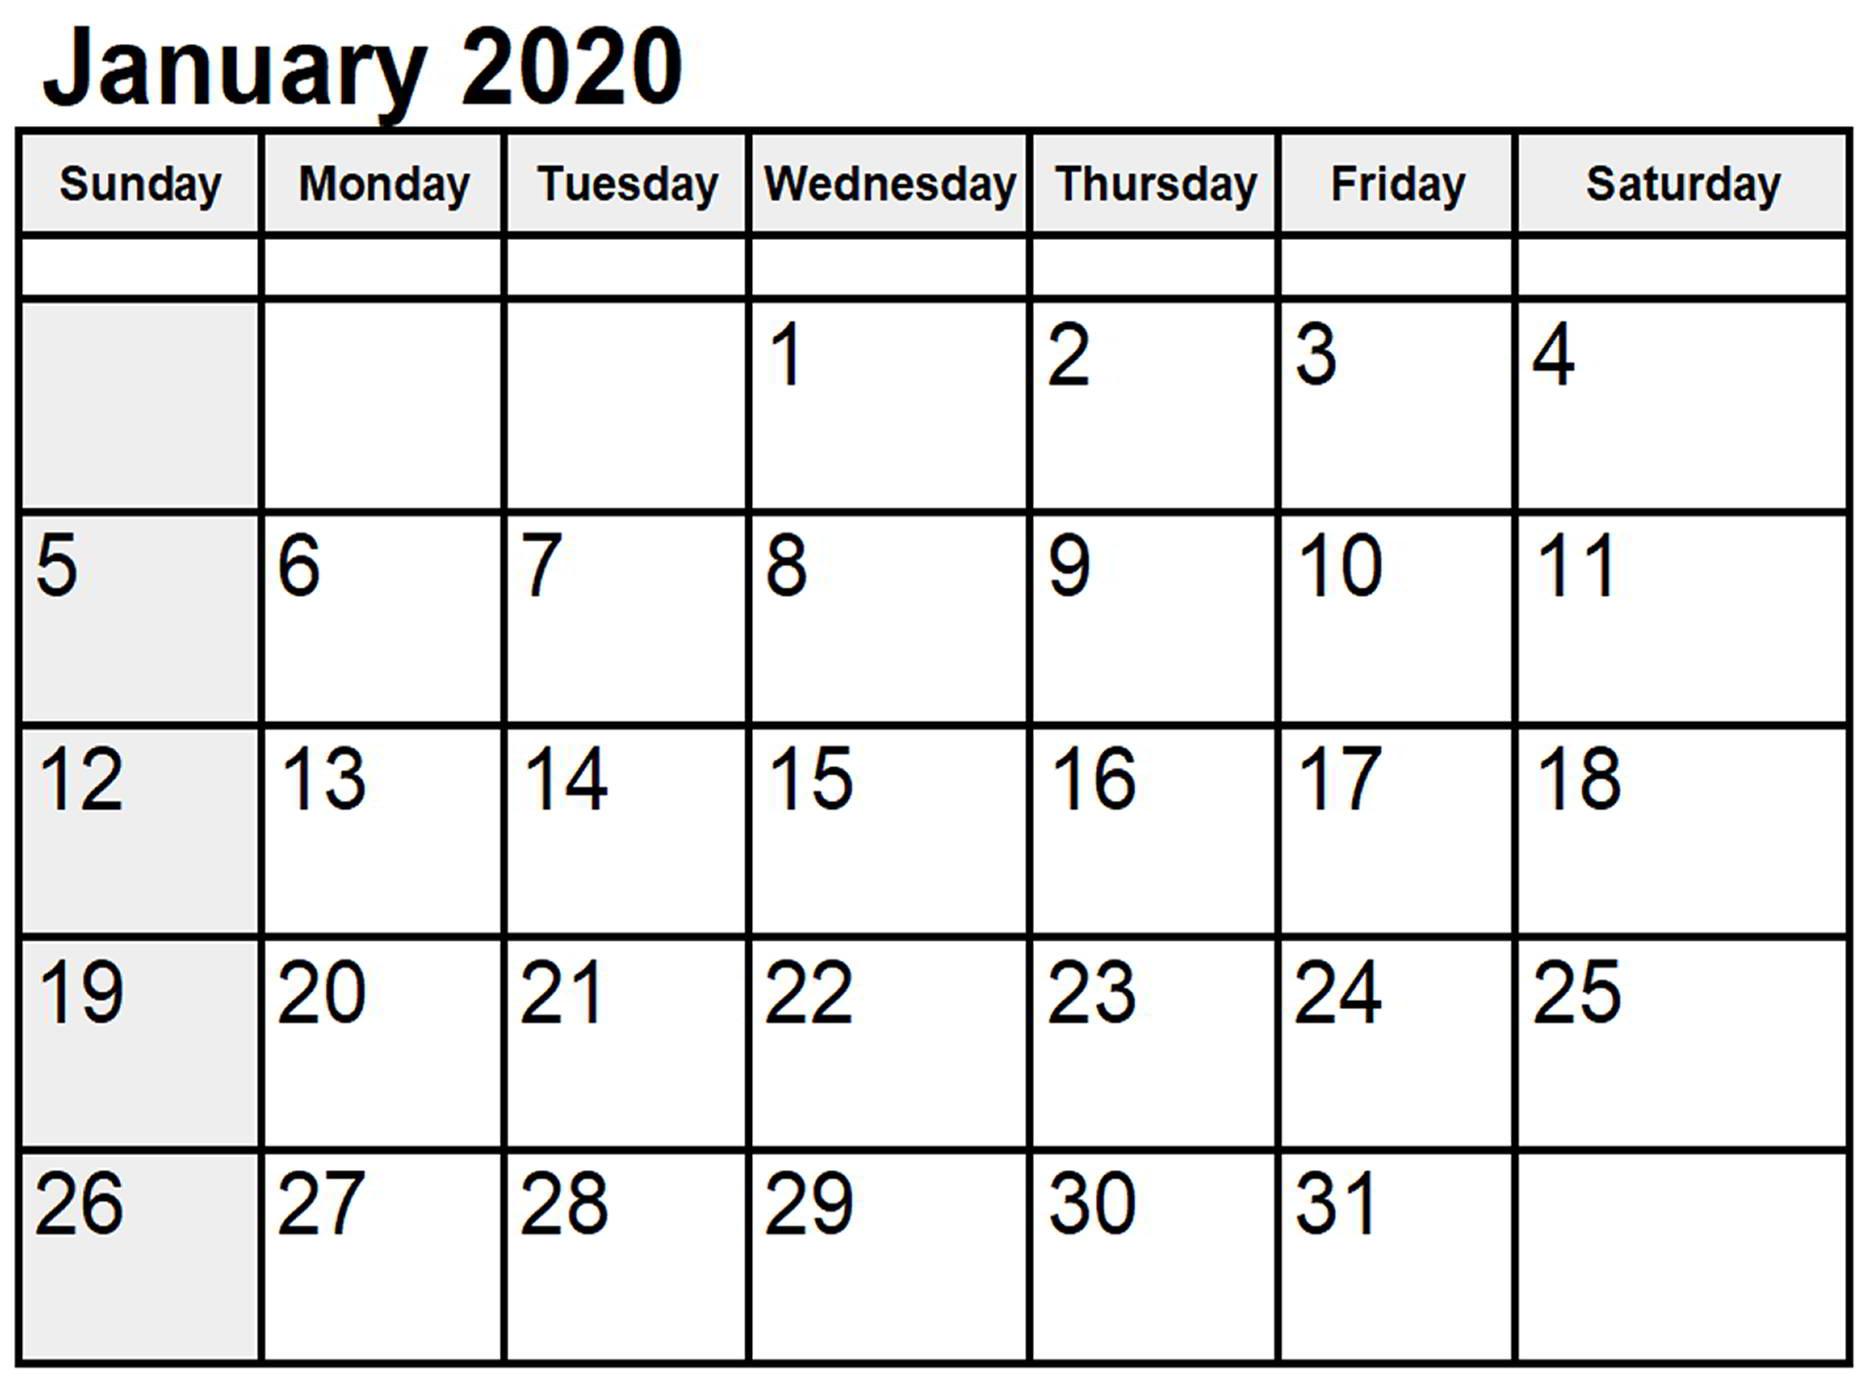 January 2020 Calendar Printable Cute | 12 Month Printable